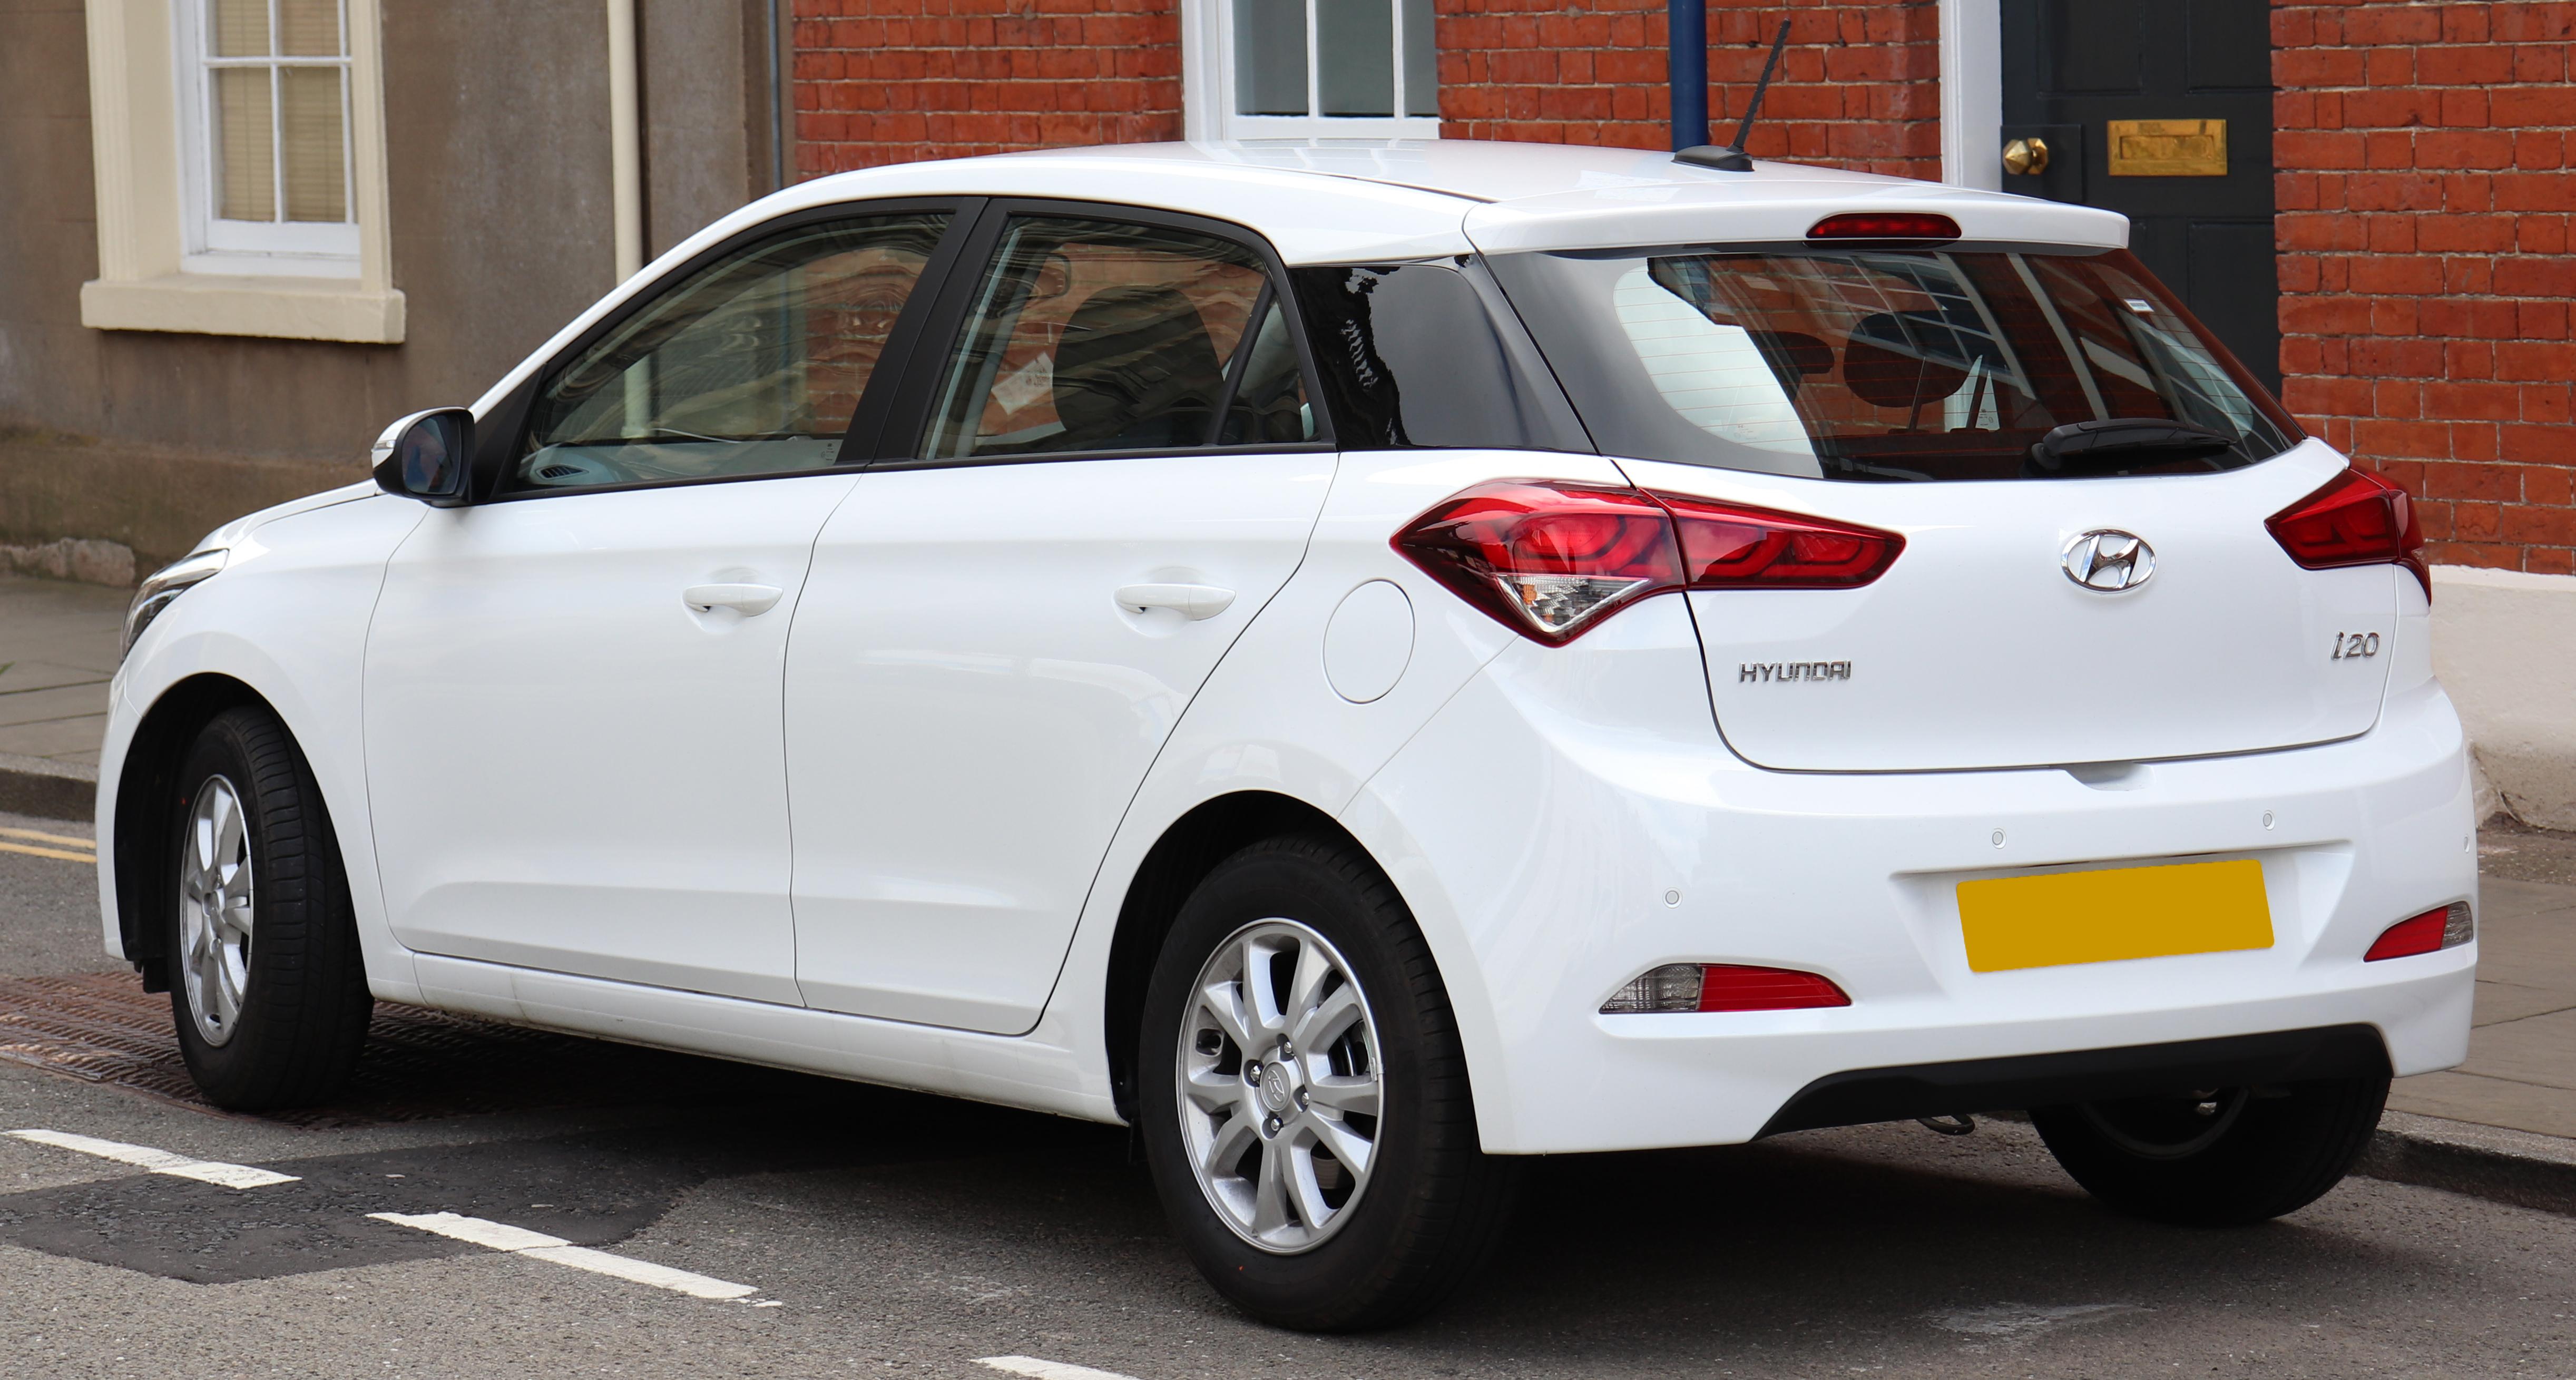 File:2018 Hyundai i20 SE MPi 1.2 Rear.jpg